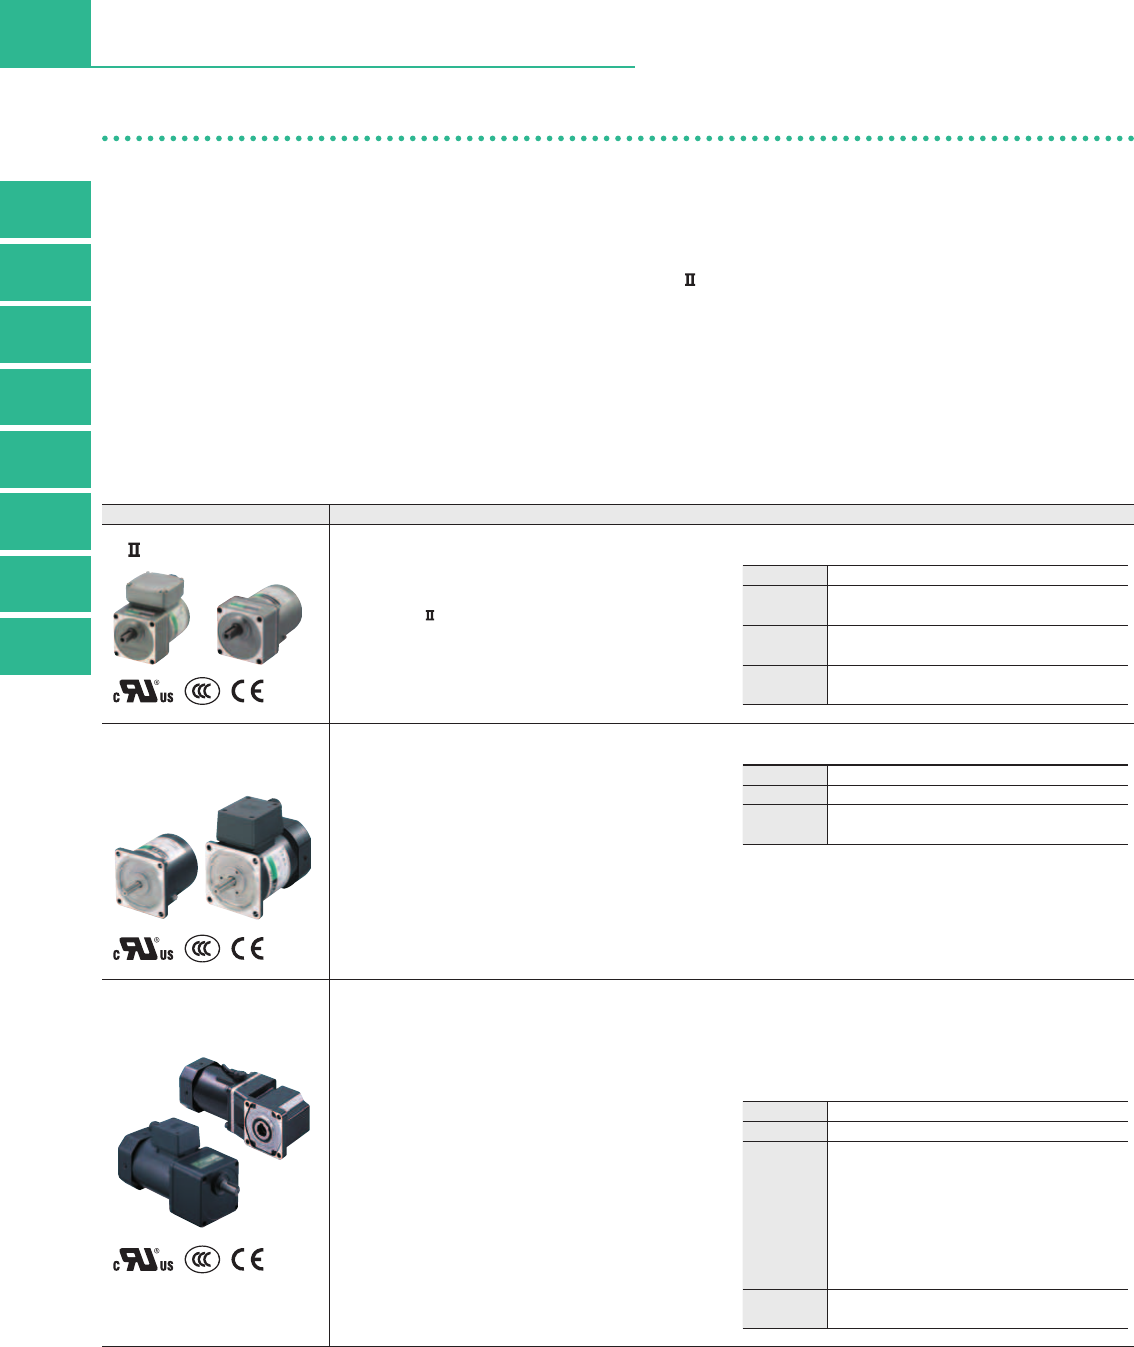 Flow Oriental Motors Kii Series World K Bh Single Phase Induction Motor Equivalent Circuit Diagram C 114